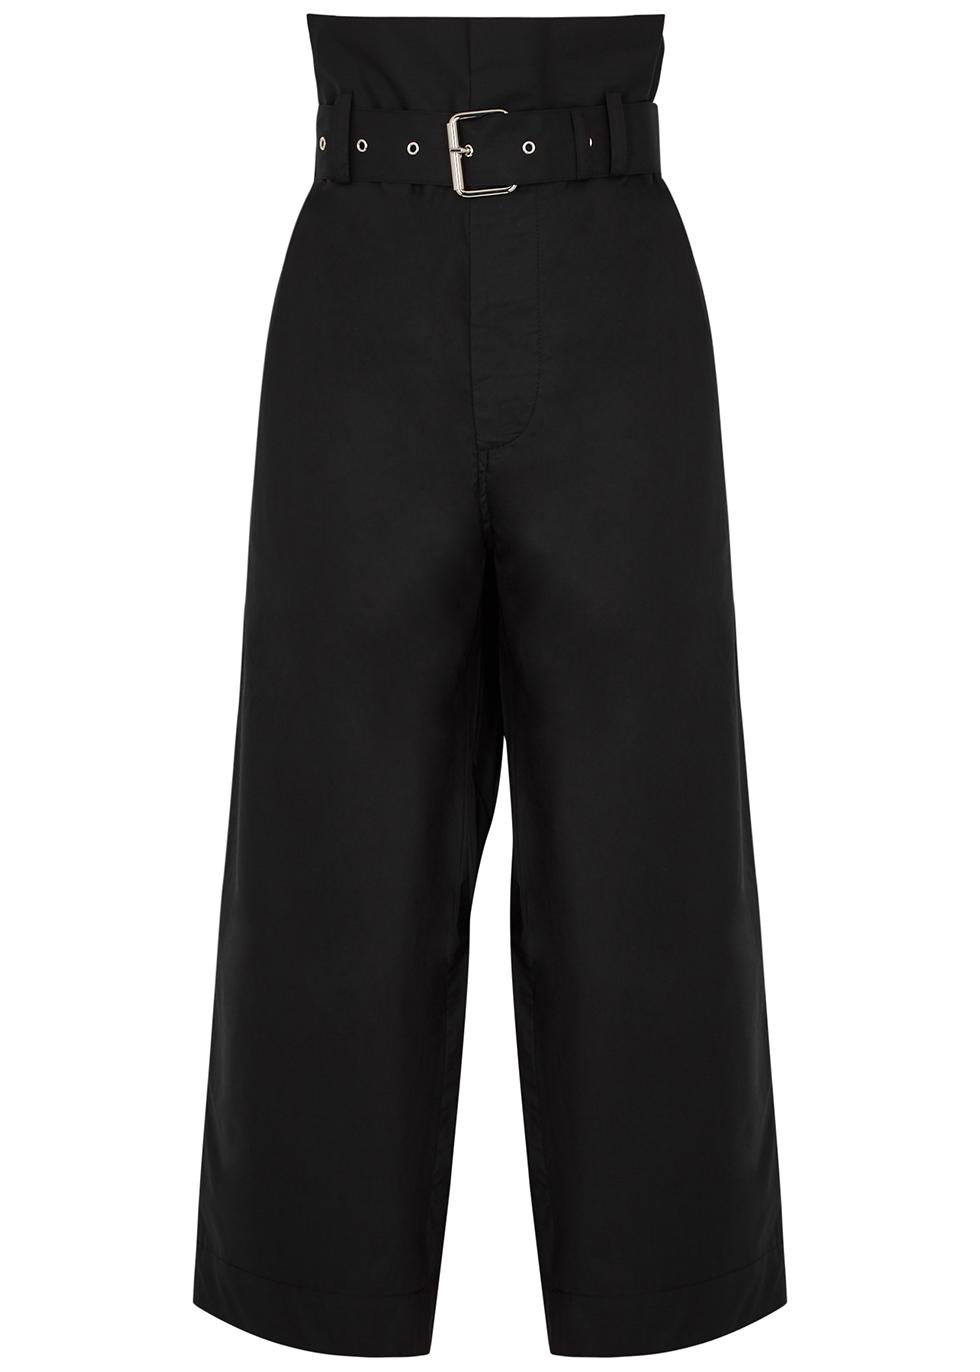 Black wide-leg cropped cotton trousers